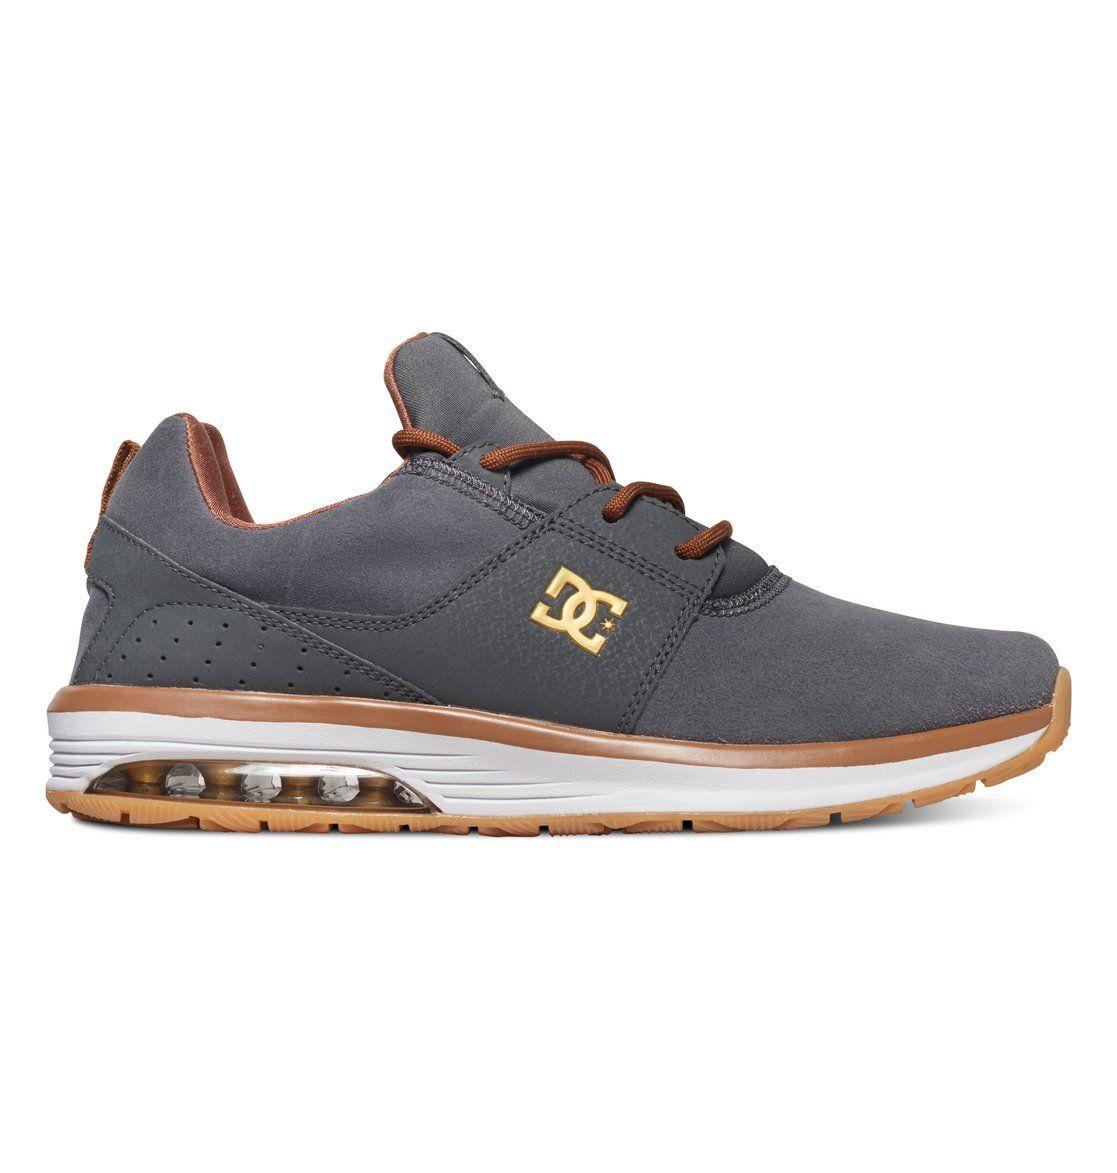 dcshoes, Men's Heathrow IA Shoes, DARK SHADOW ...